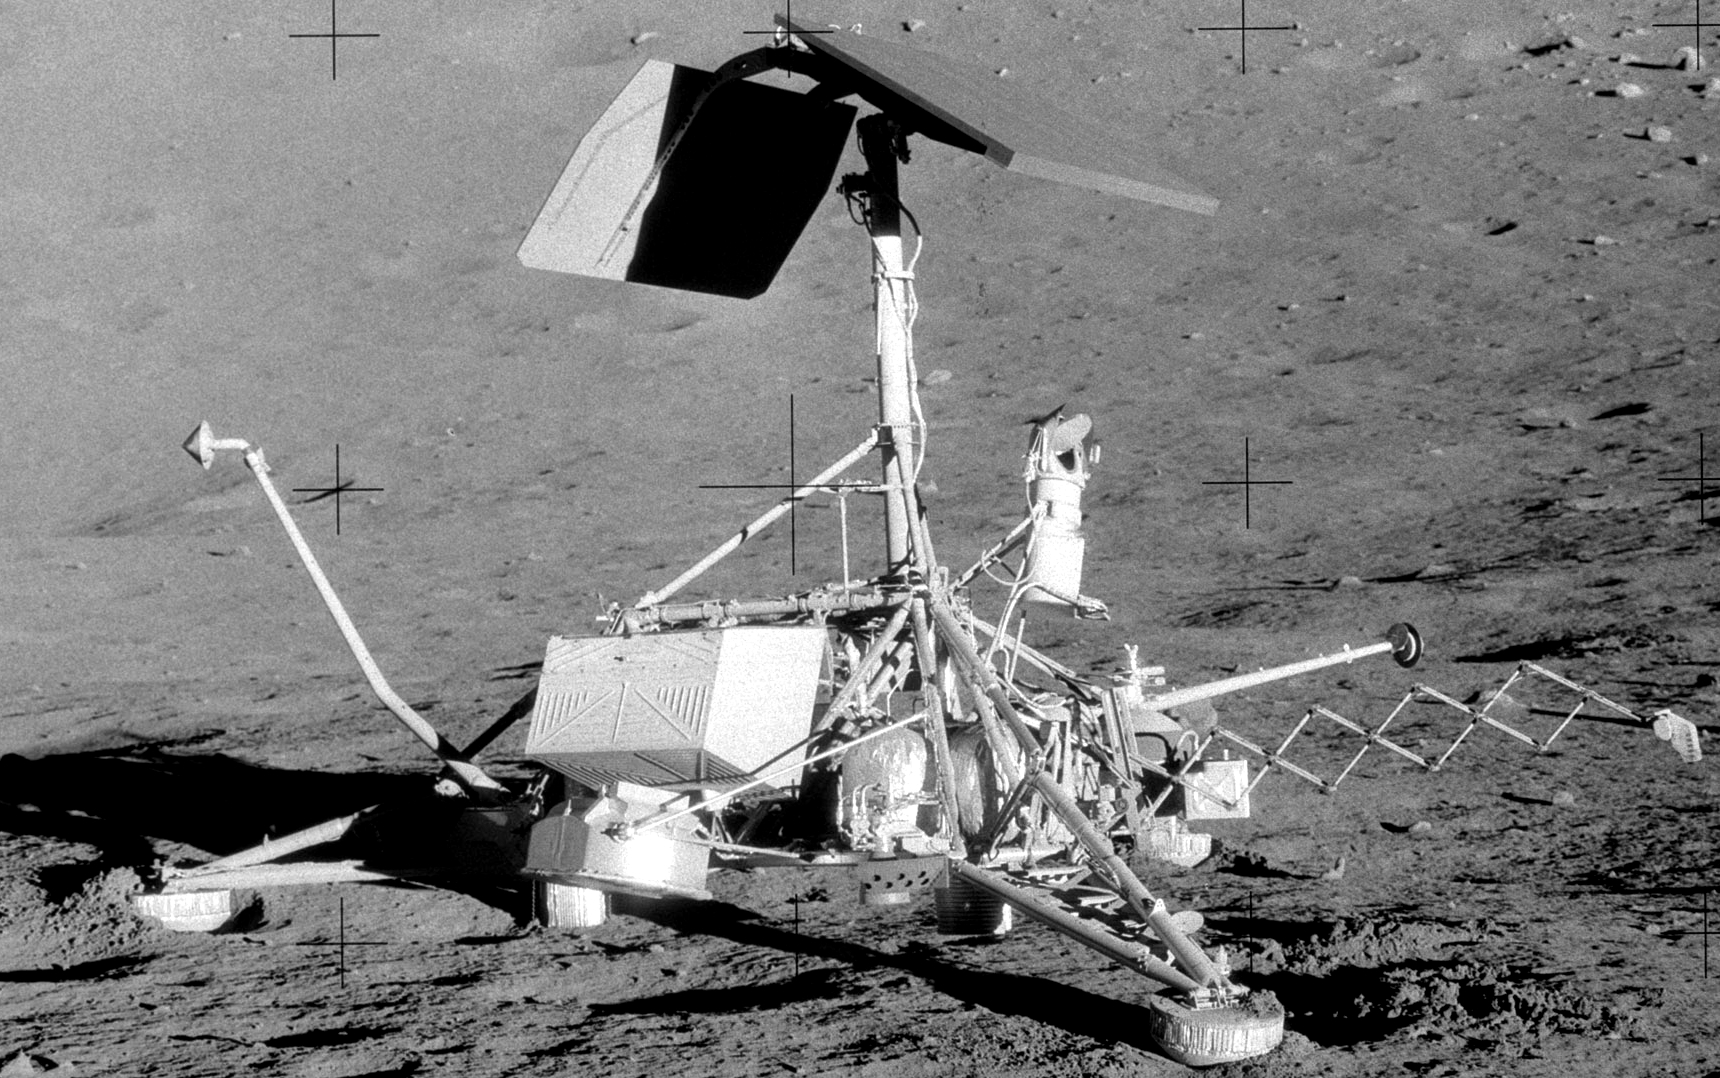 surveyor moon mission - photo #8